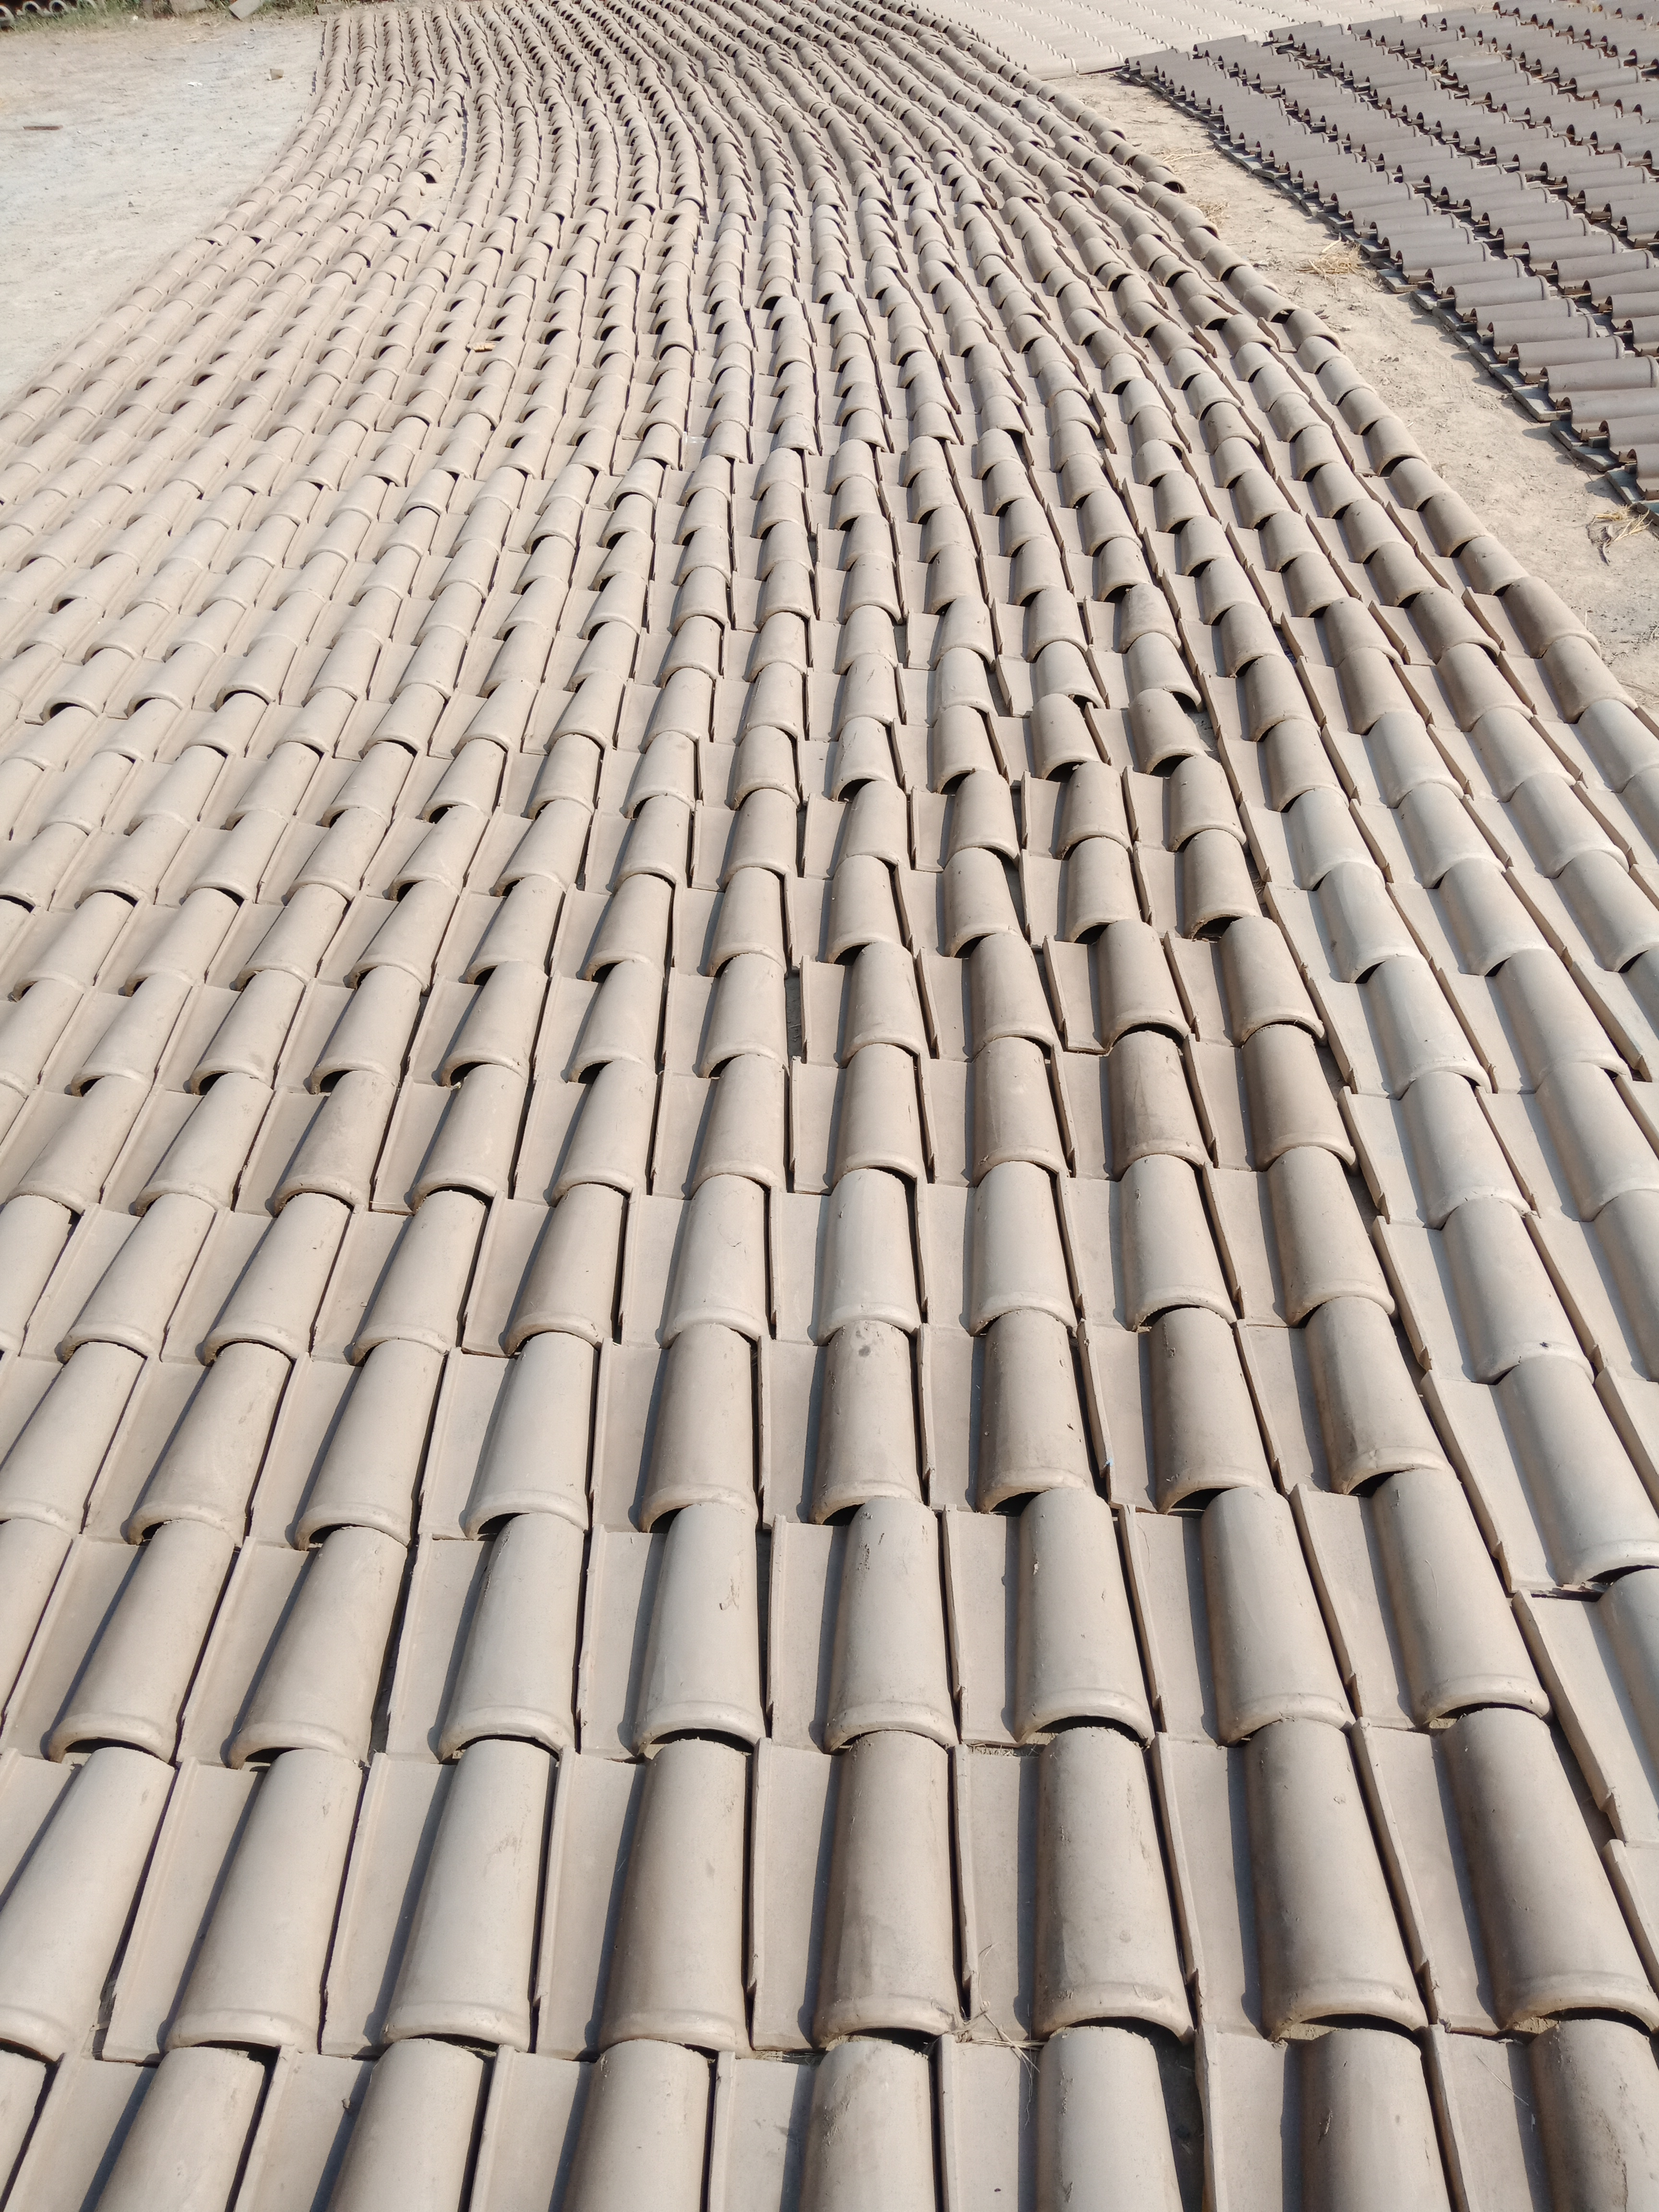 8 Khaprail Tiles Manufacturer Roof Tiles in Pakistan Terracotta Tiles Pakistan.